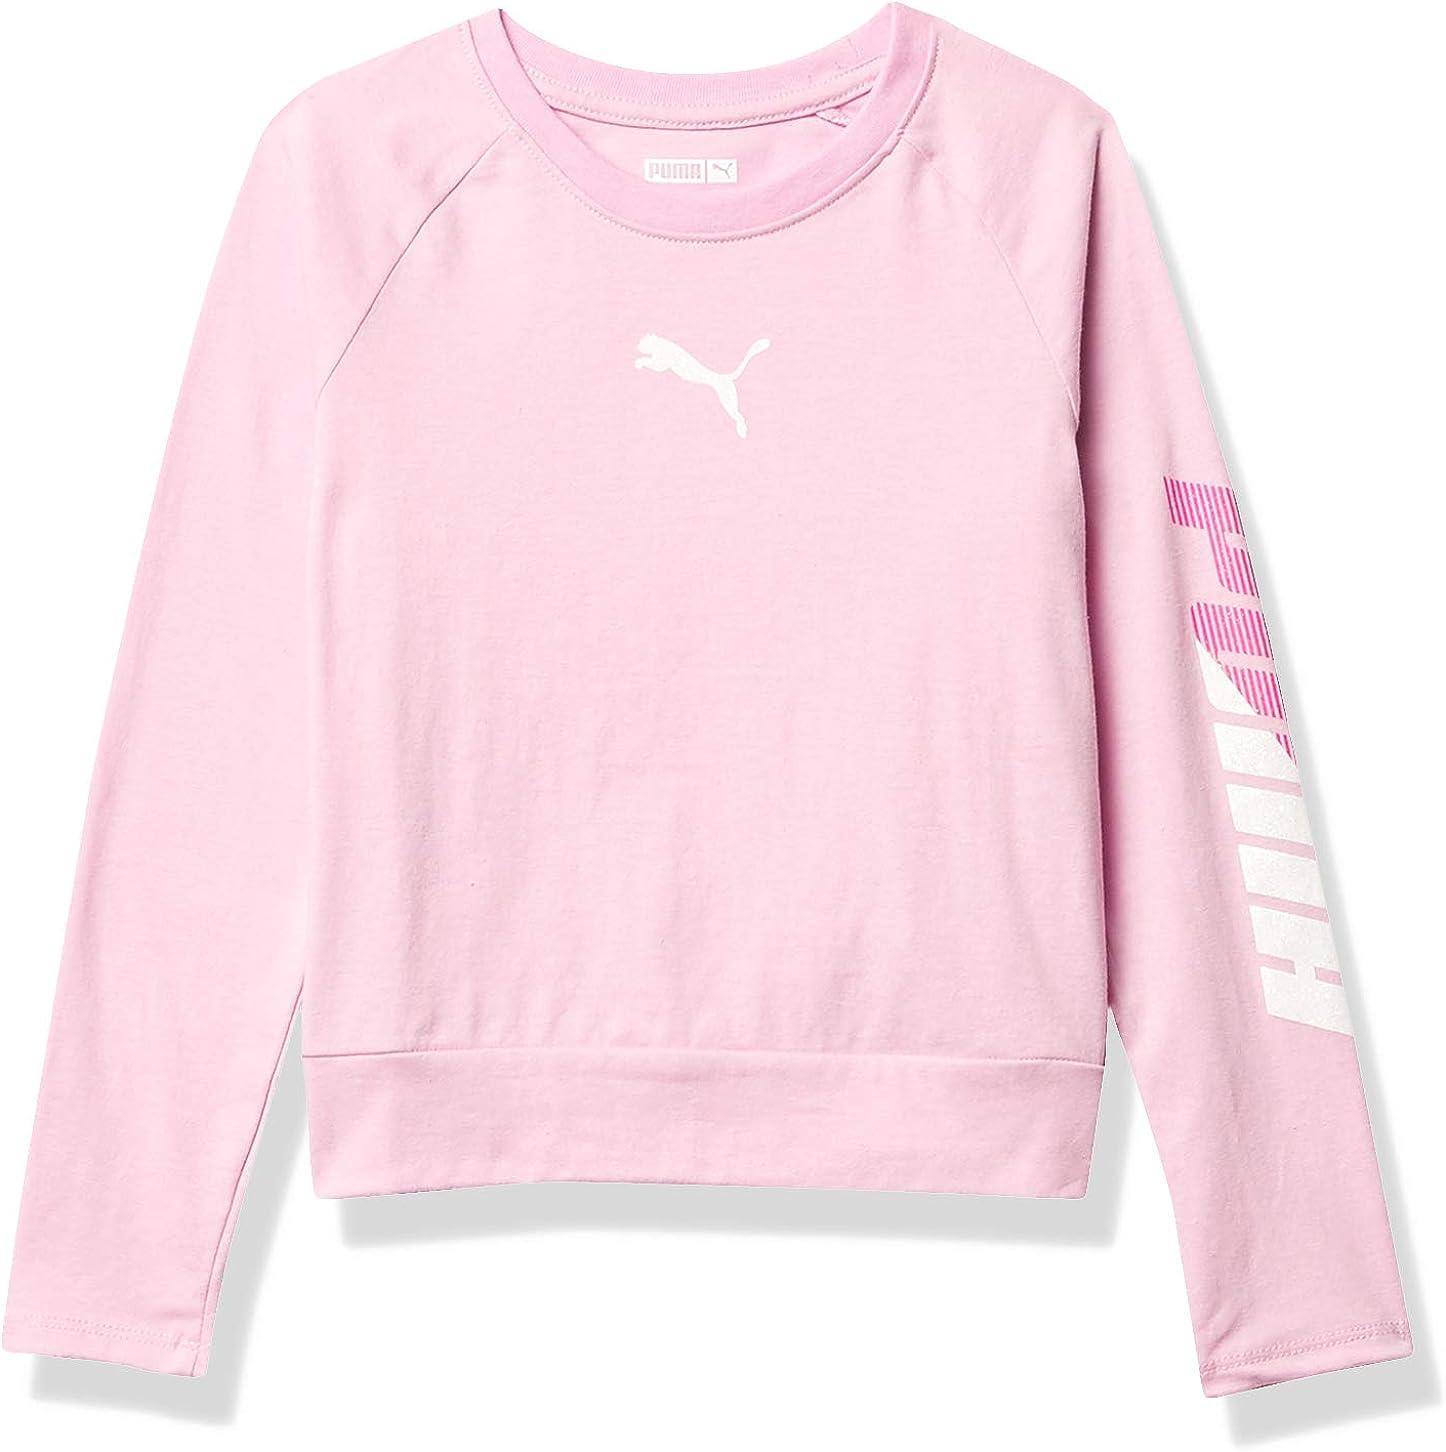 PUMA Girls' Longsleeve T-Shirt